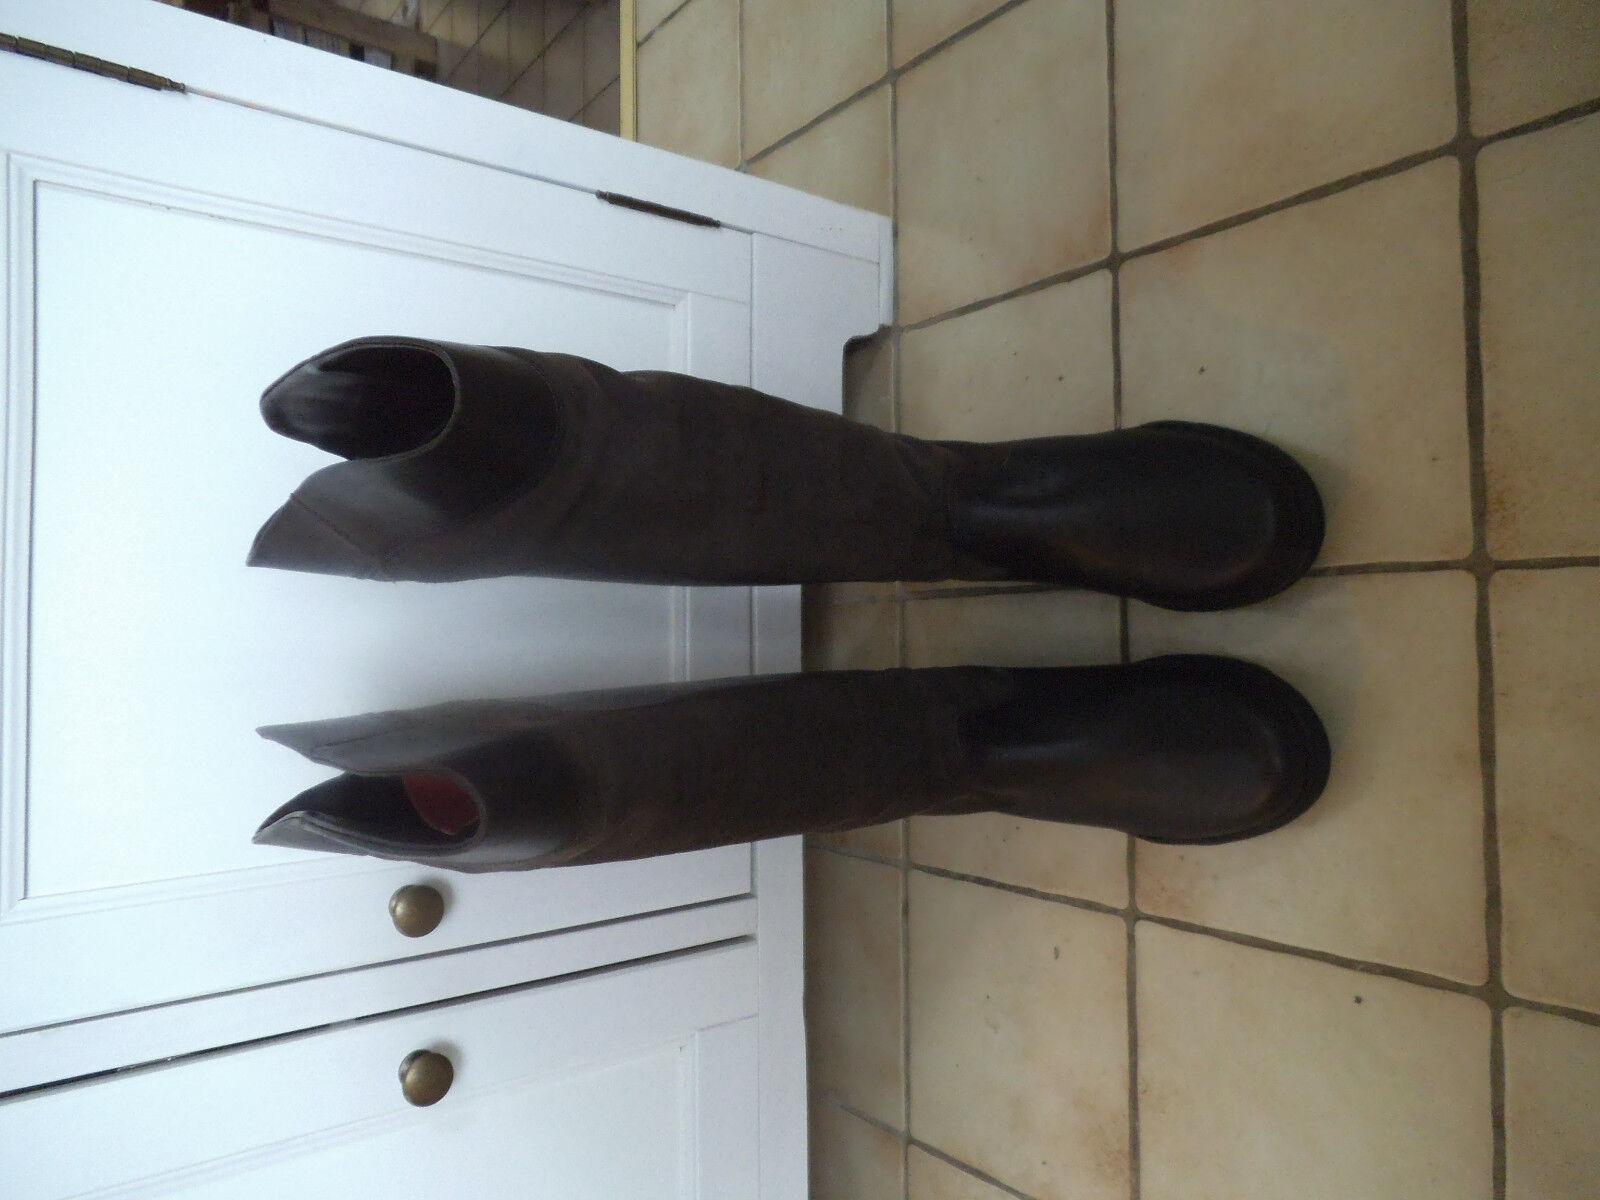 Fashion Stiefel Winter Leder dunkelbraun Gr. 42 W43/H47 W43/H47 42 999ff5